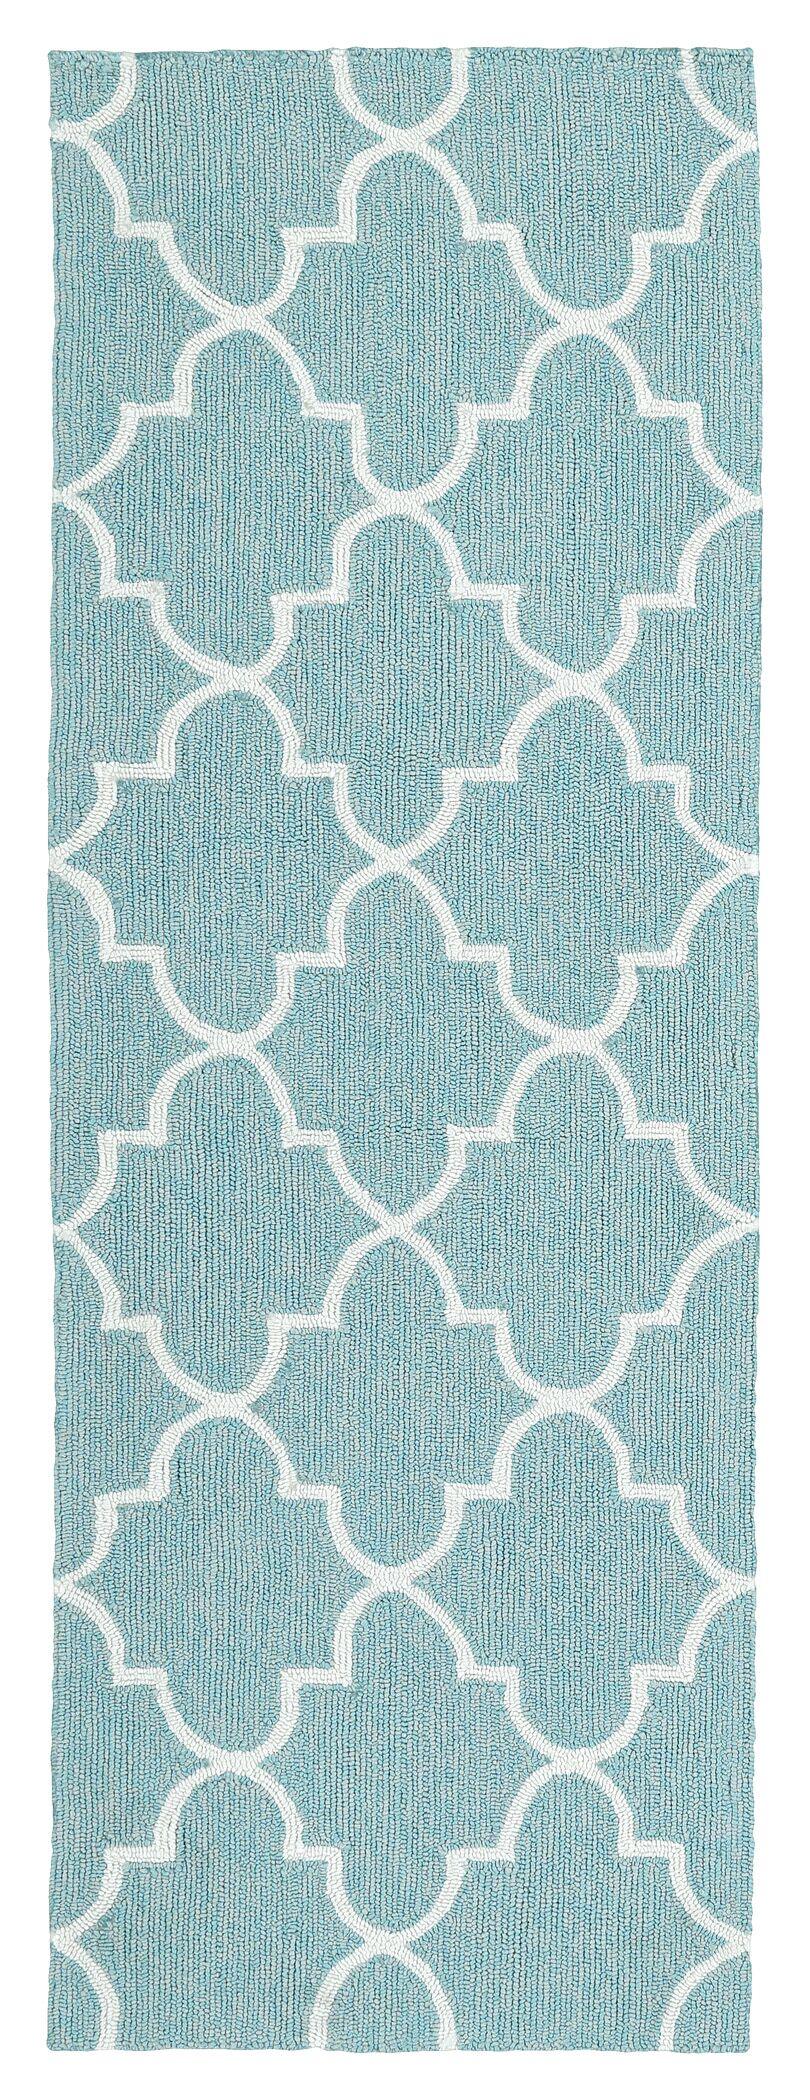 Cowan Blue IndoorOutdoor Area Rug Rug Size: Rectangle 8' x 10'